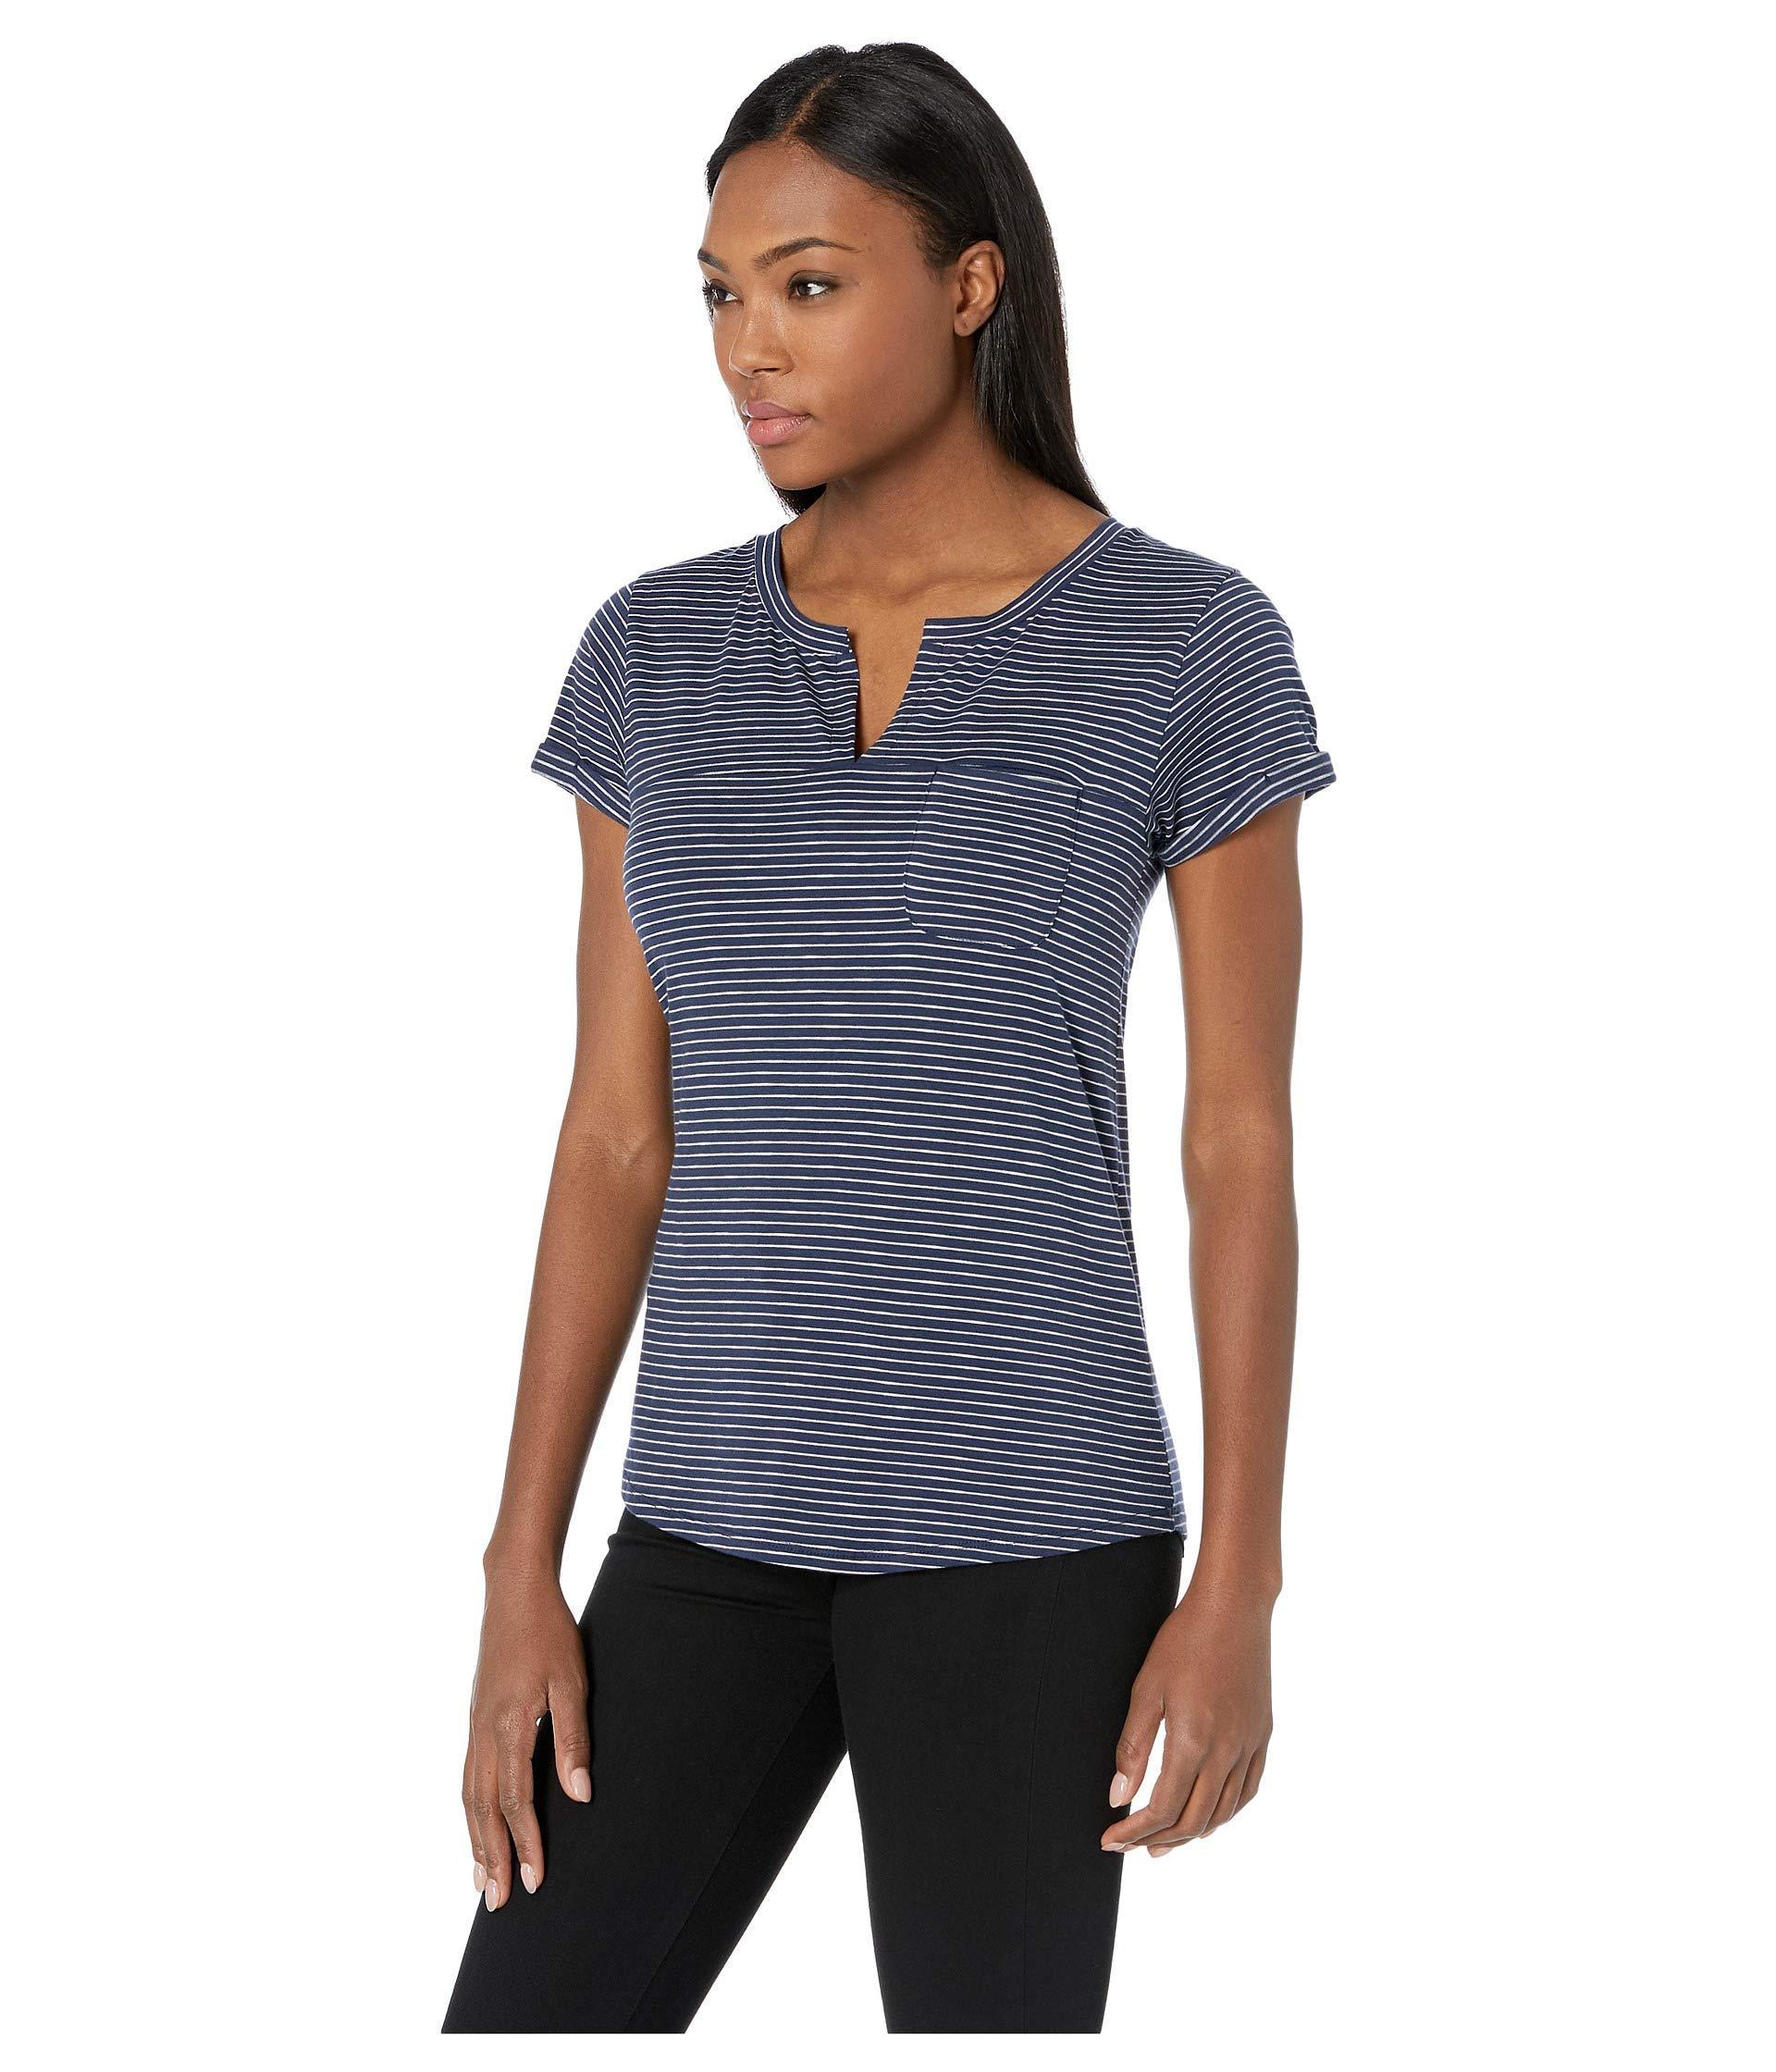 6165abac46 Lyst - Toad&Co Sambasta Short Sleeve Tee (heather Grey Mini Stripe) Women's  T Shirt in Blue